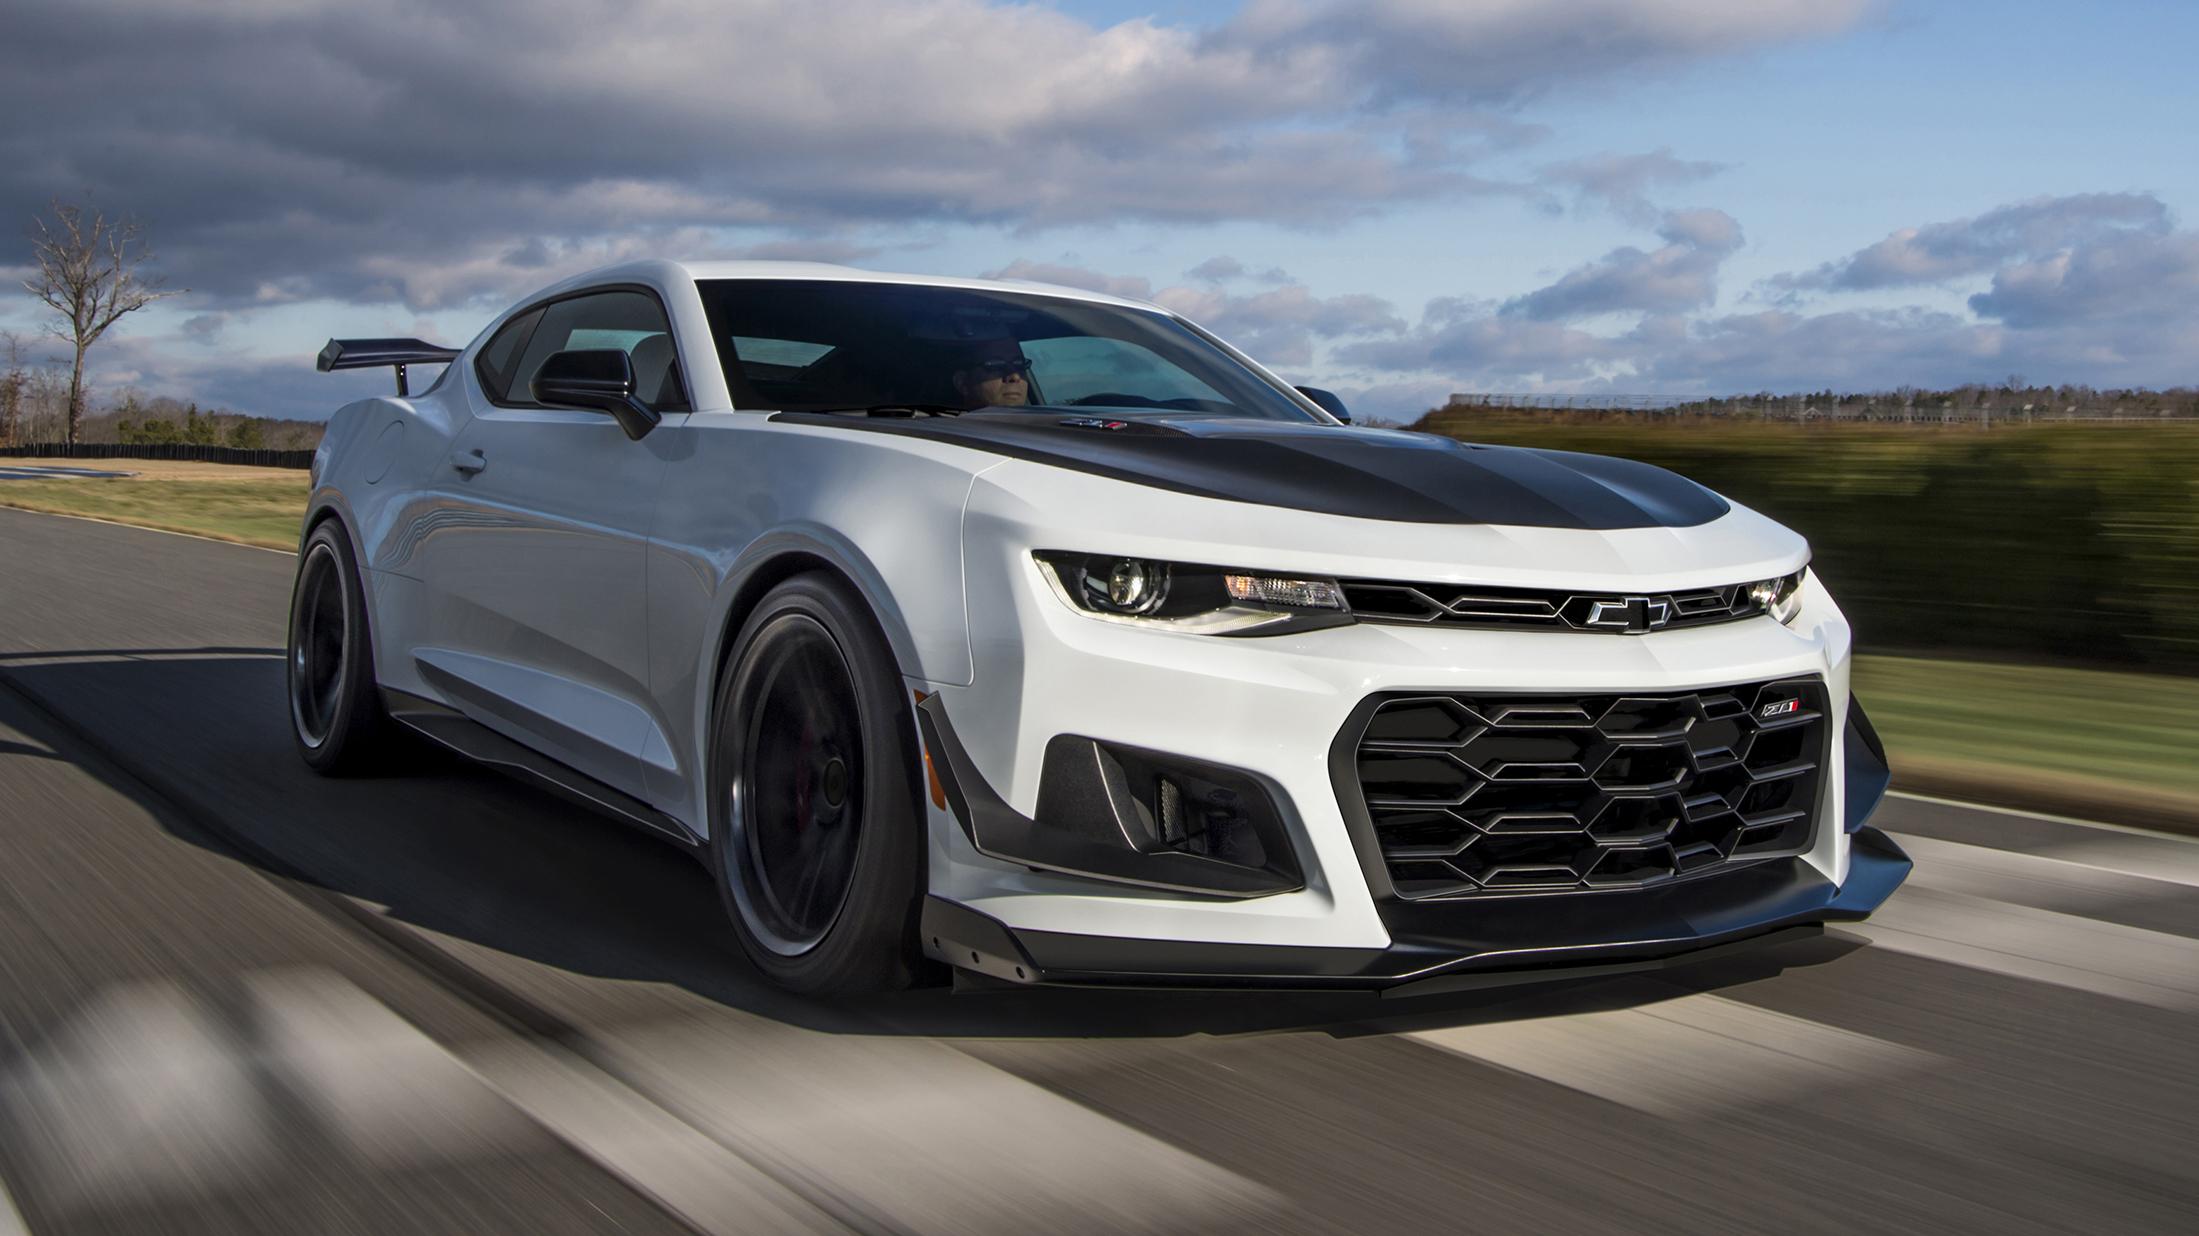 der 2018 chevrolet camaro zl1 1le – muscle cars